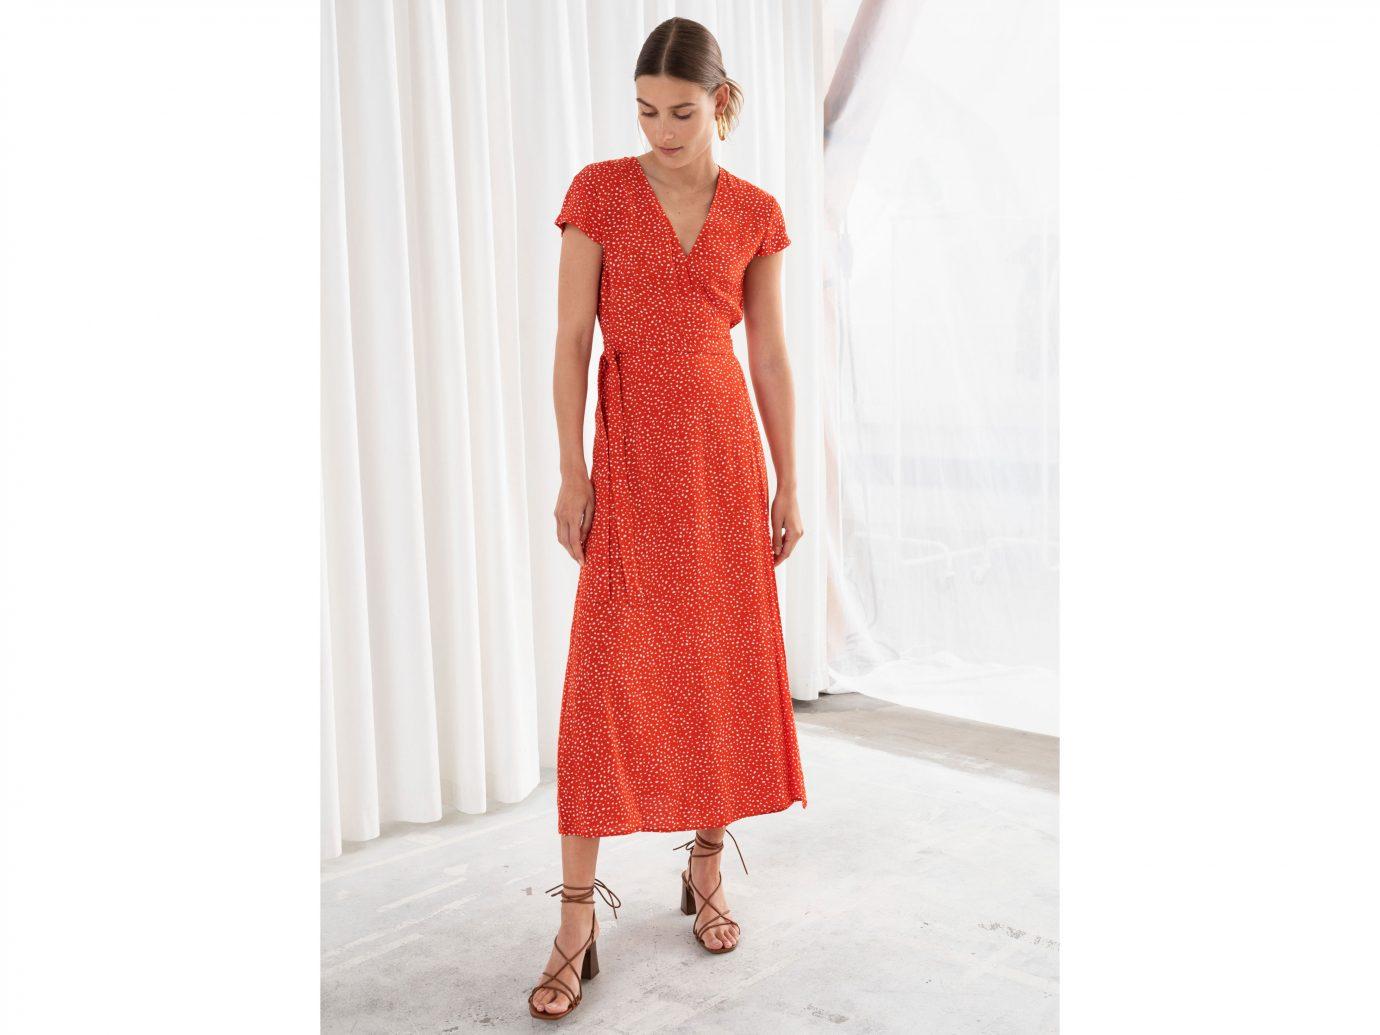 & Other Stories Polka Dot Midi Wrap Dress